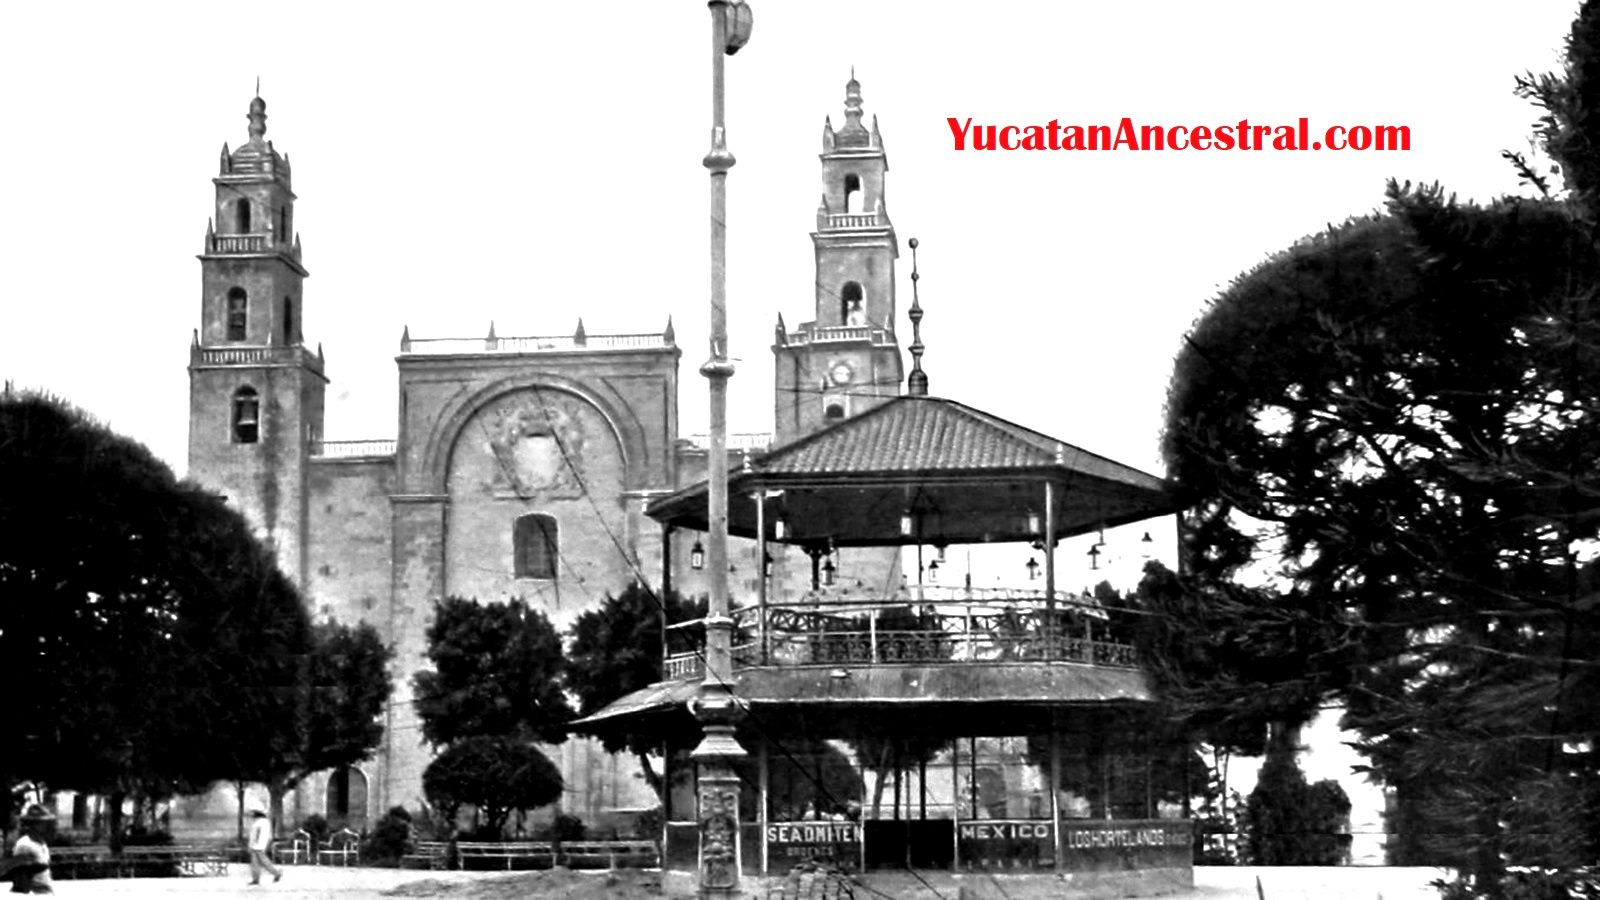 Merida 1872 Yucatan Ancestral